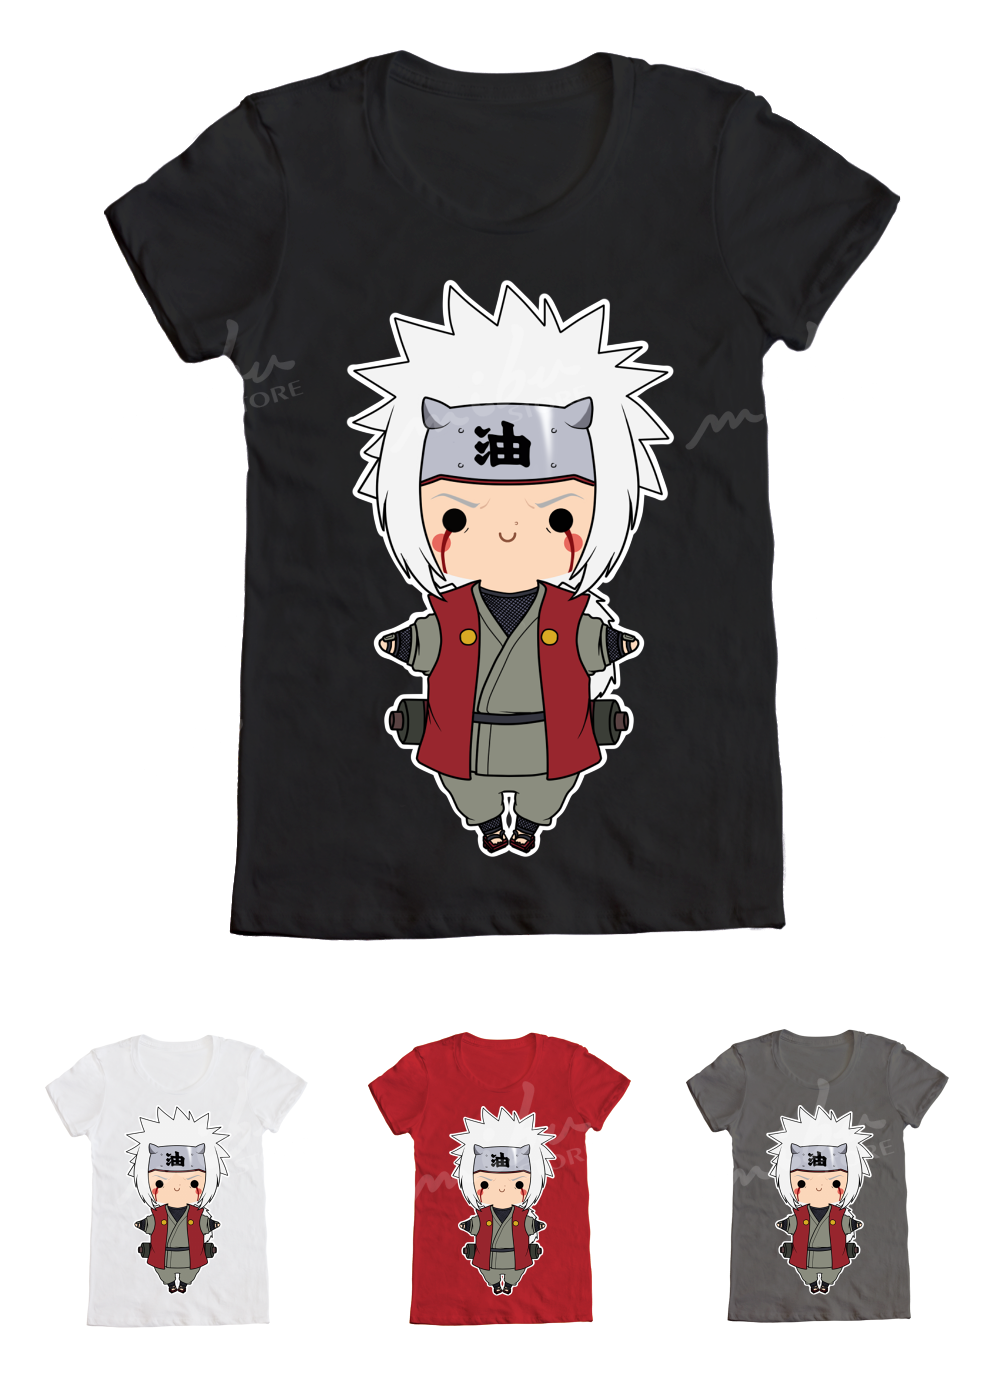 Pin By Ryu On Naruto Naruto Indie Brands Black And Grey